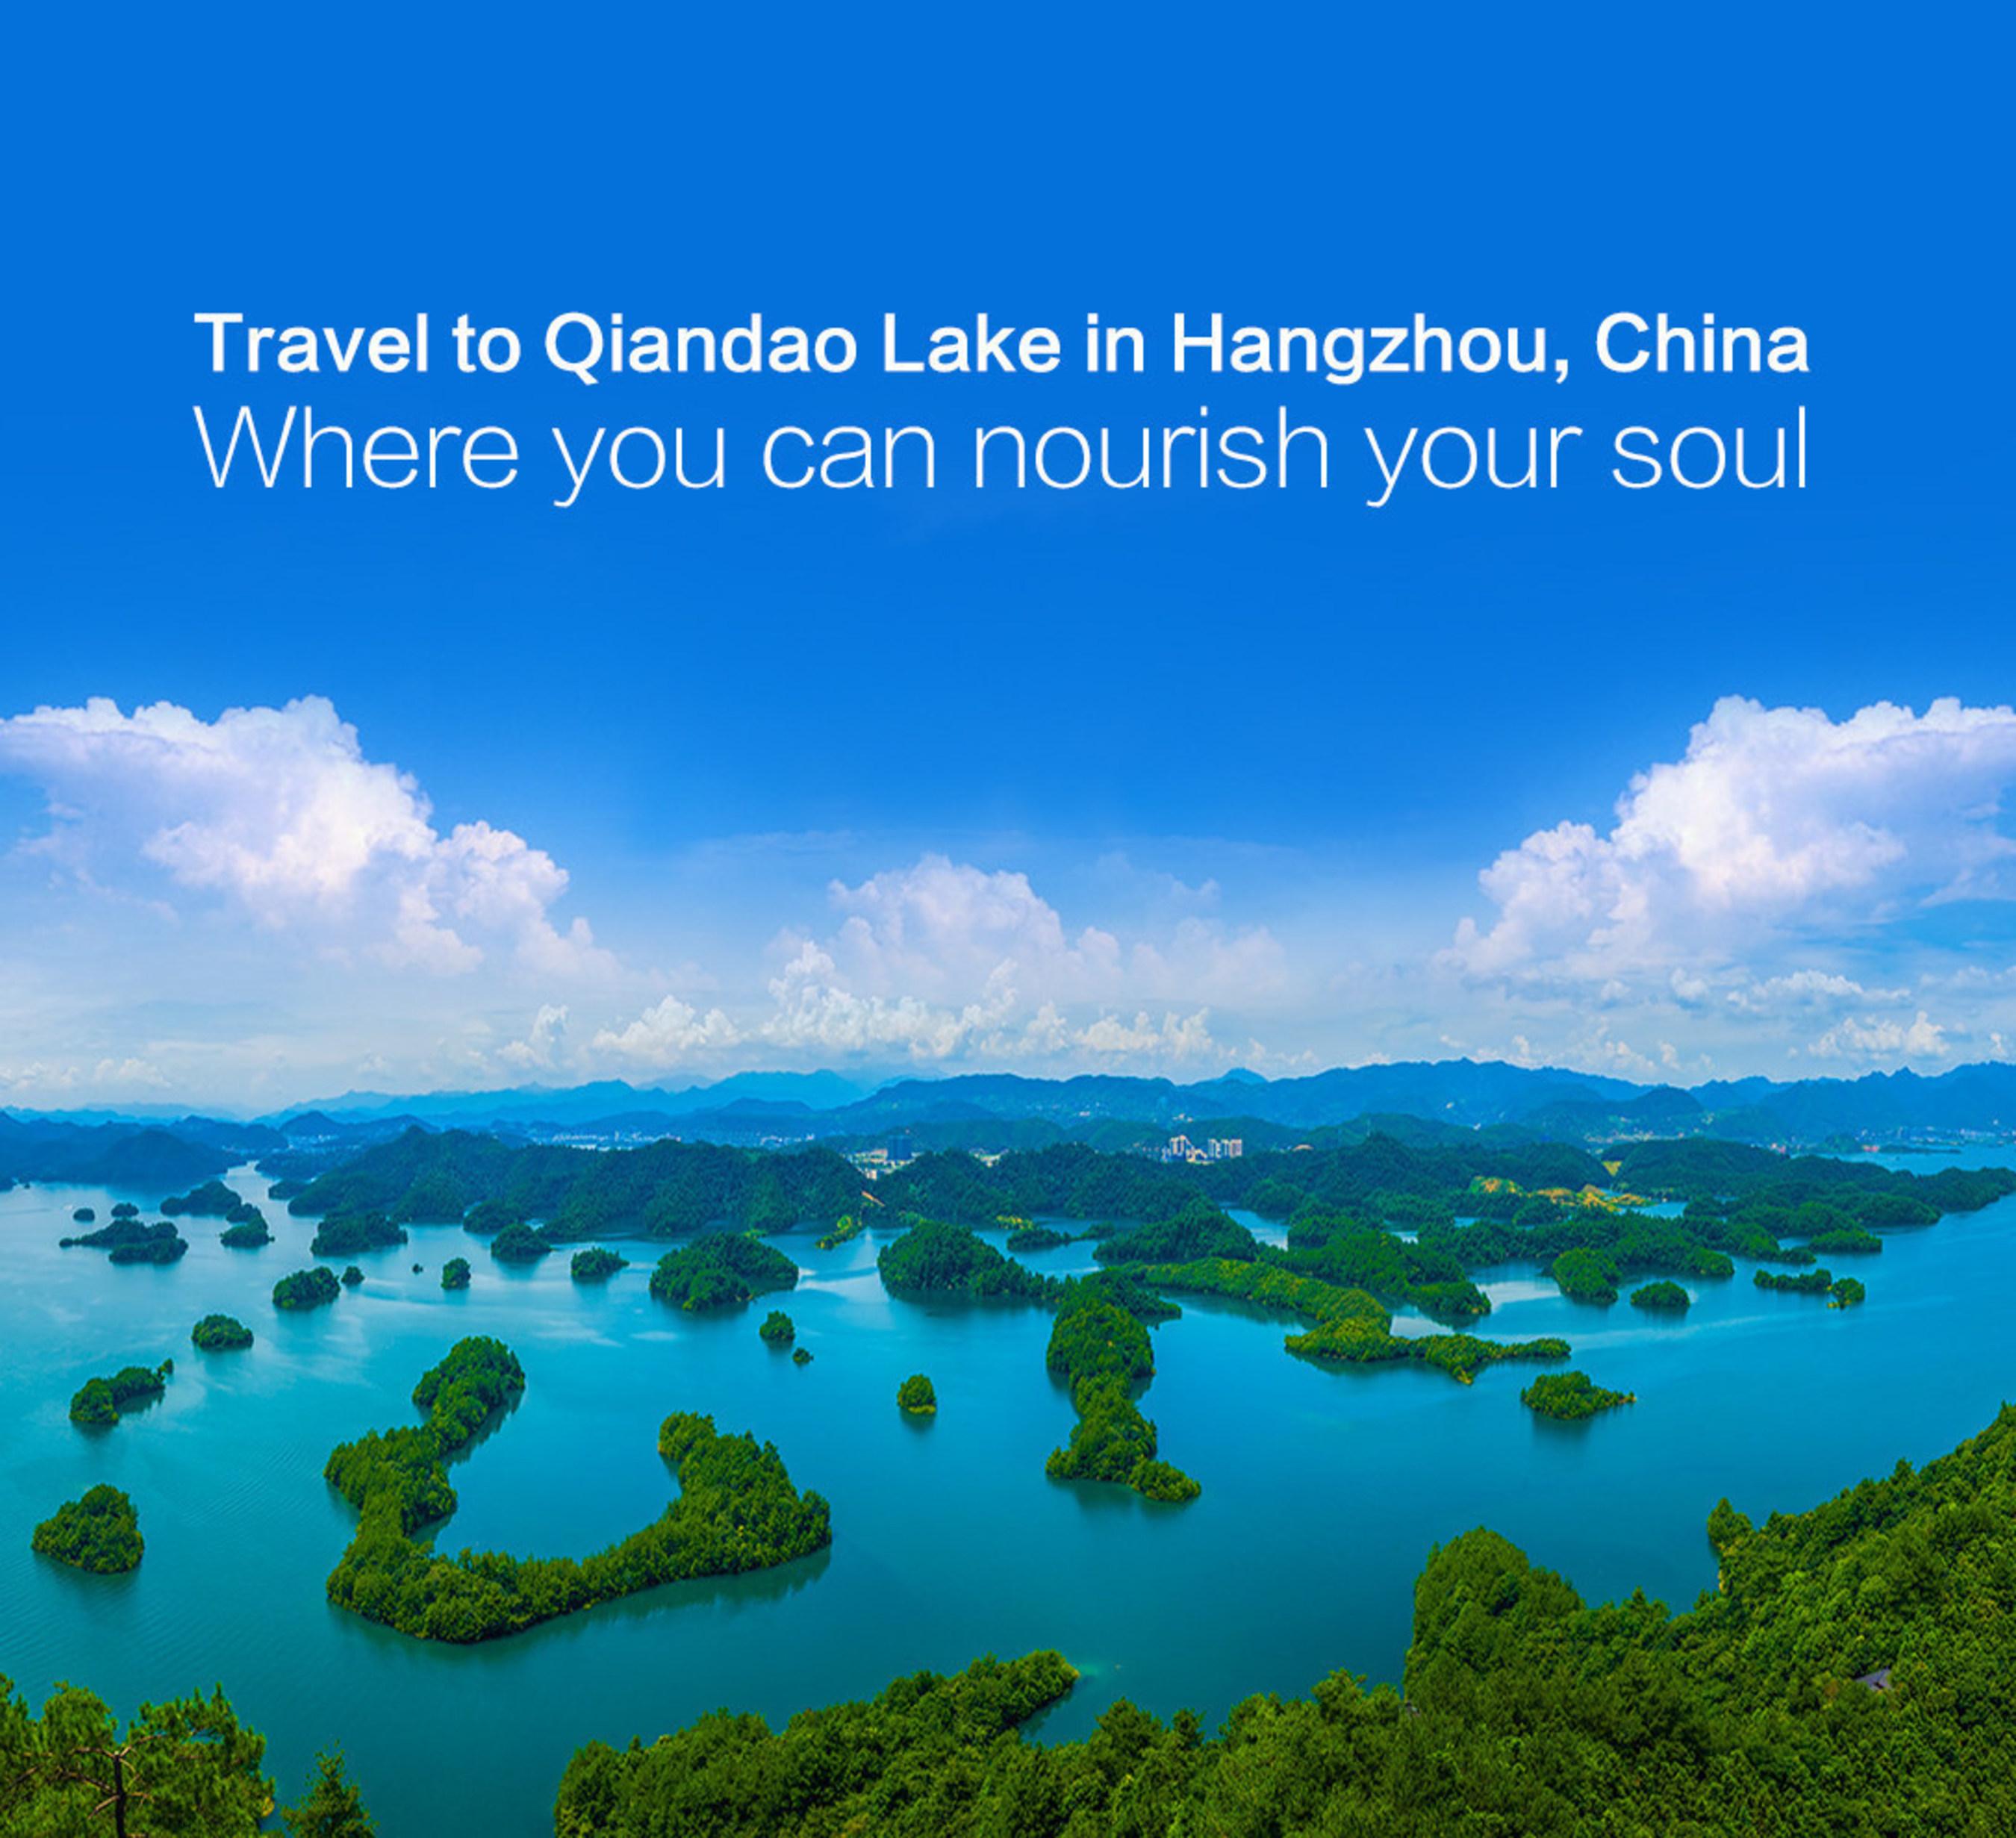 Pay a visit to Qiandao Lake, Hangzhou, China, an oasis for the soul